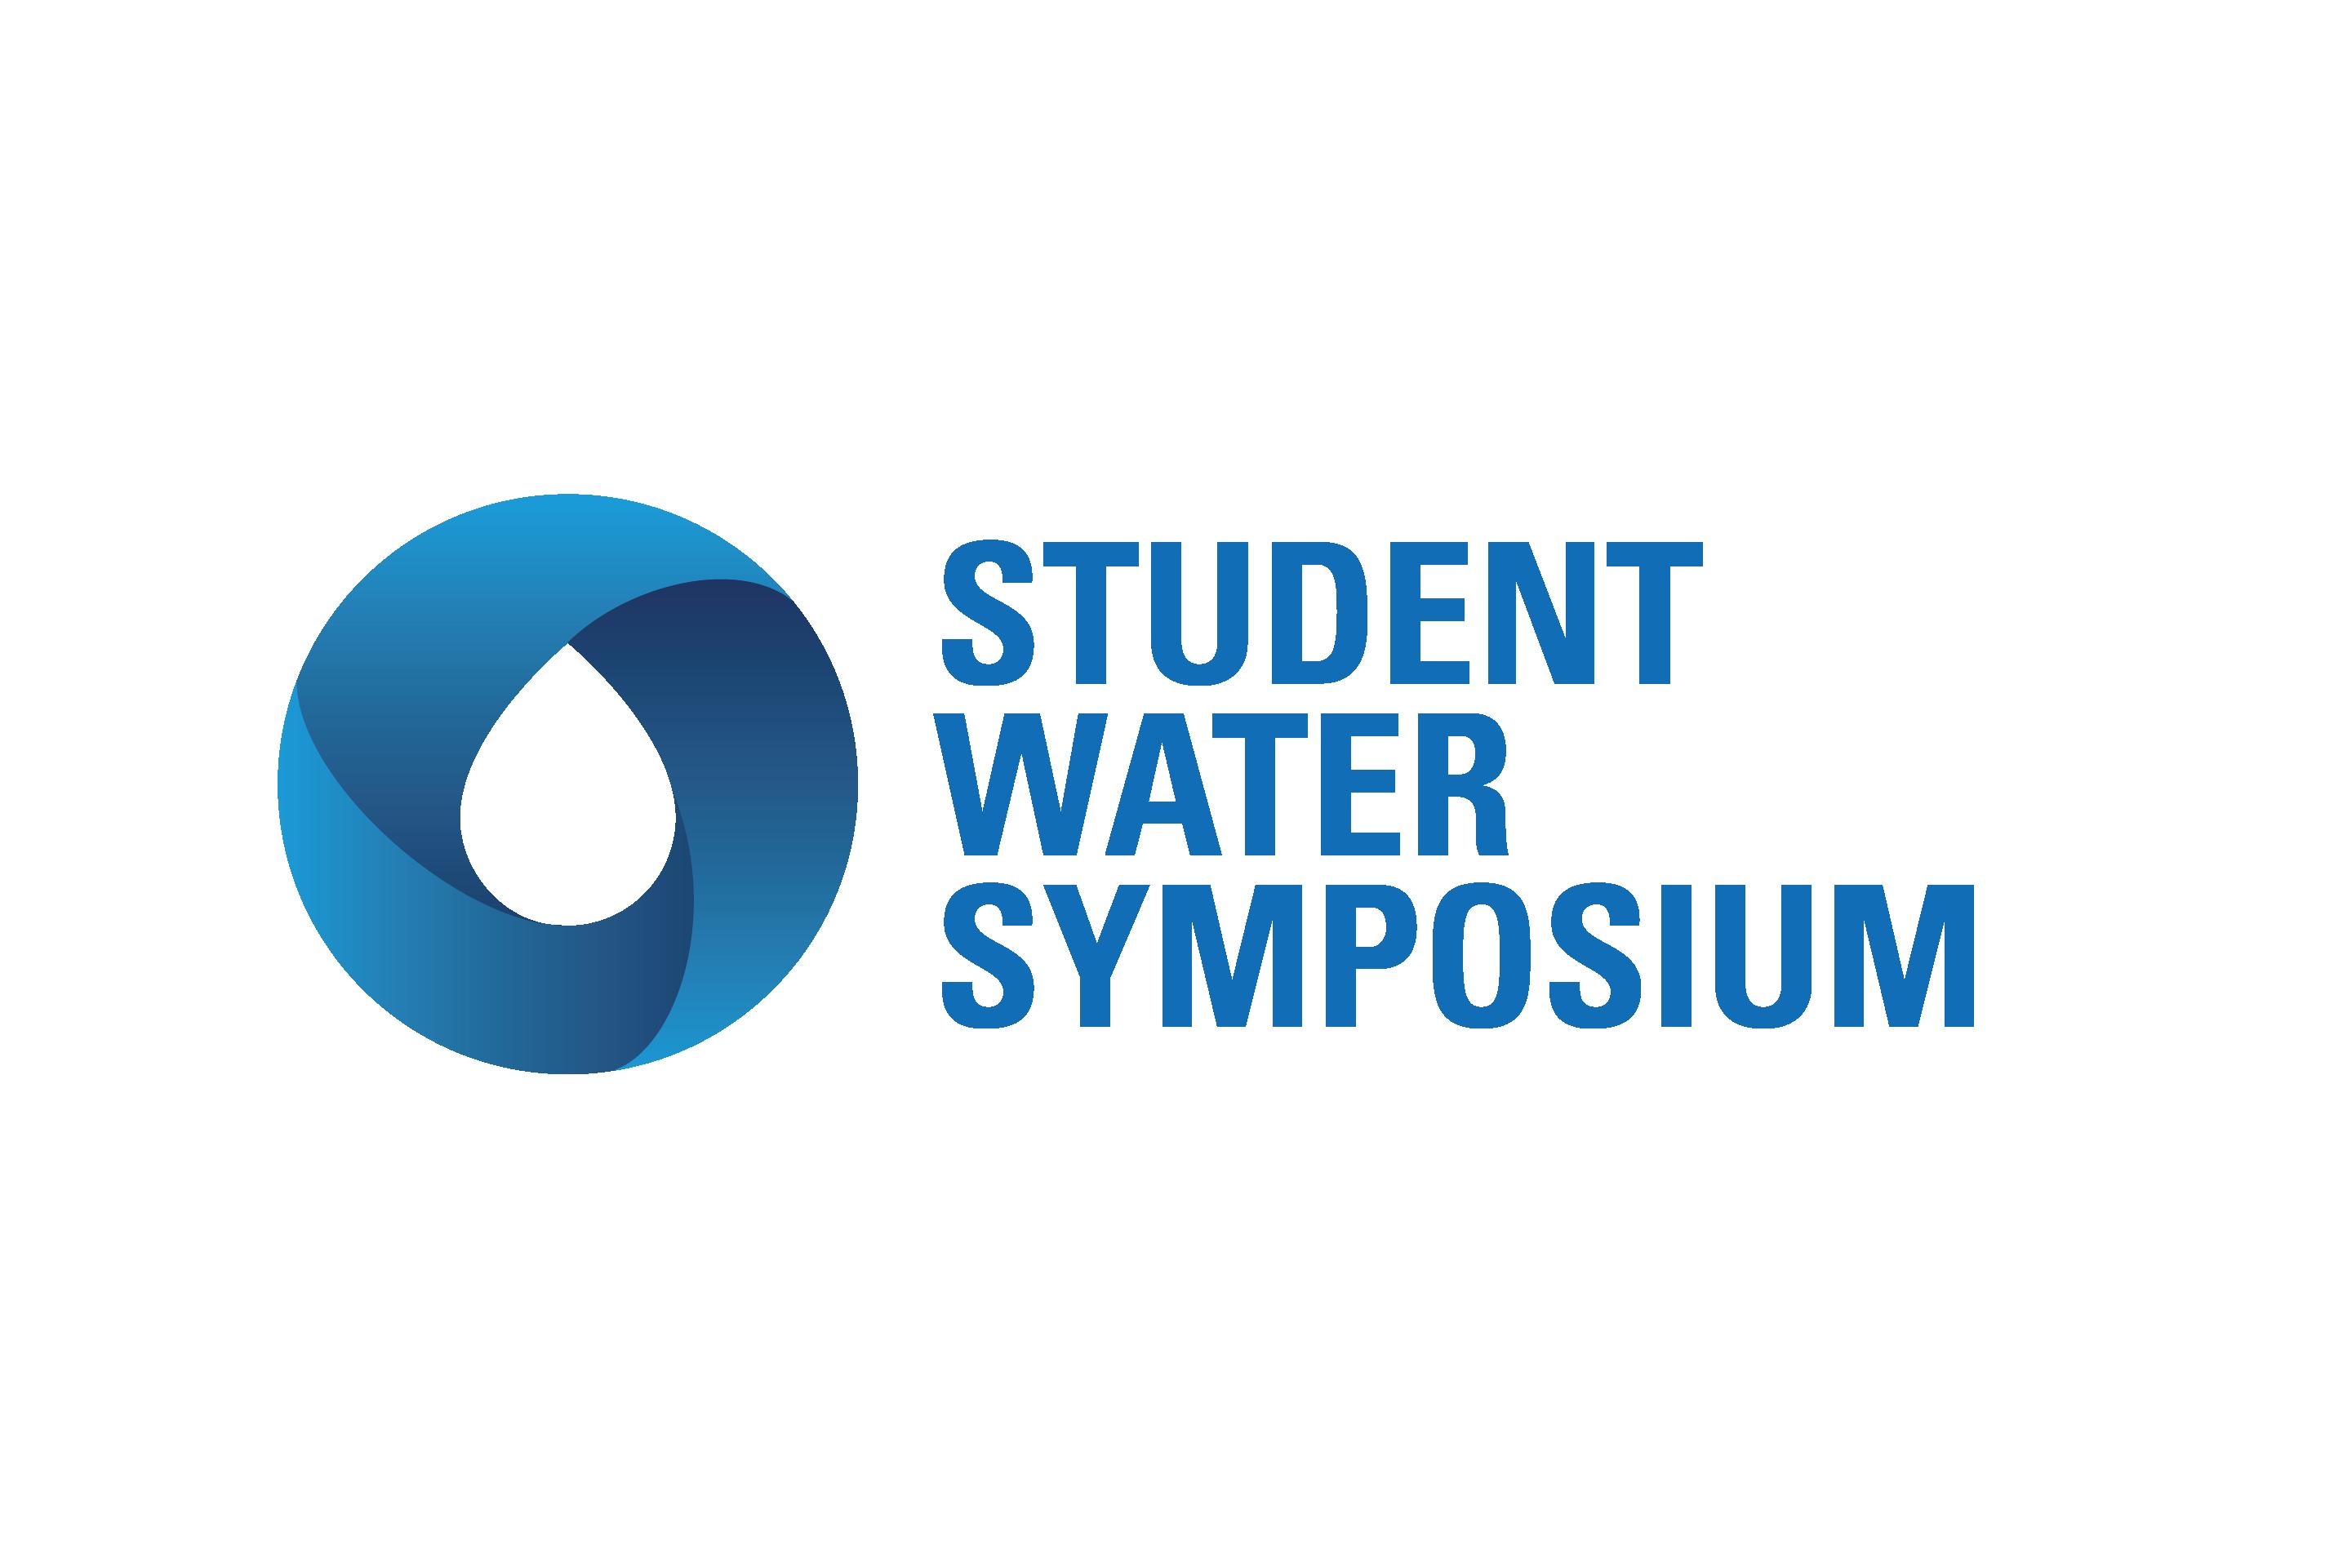 Student Water Symposium logo